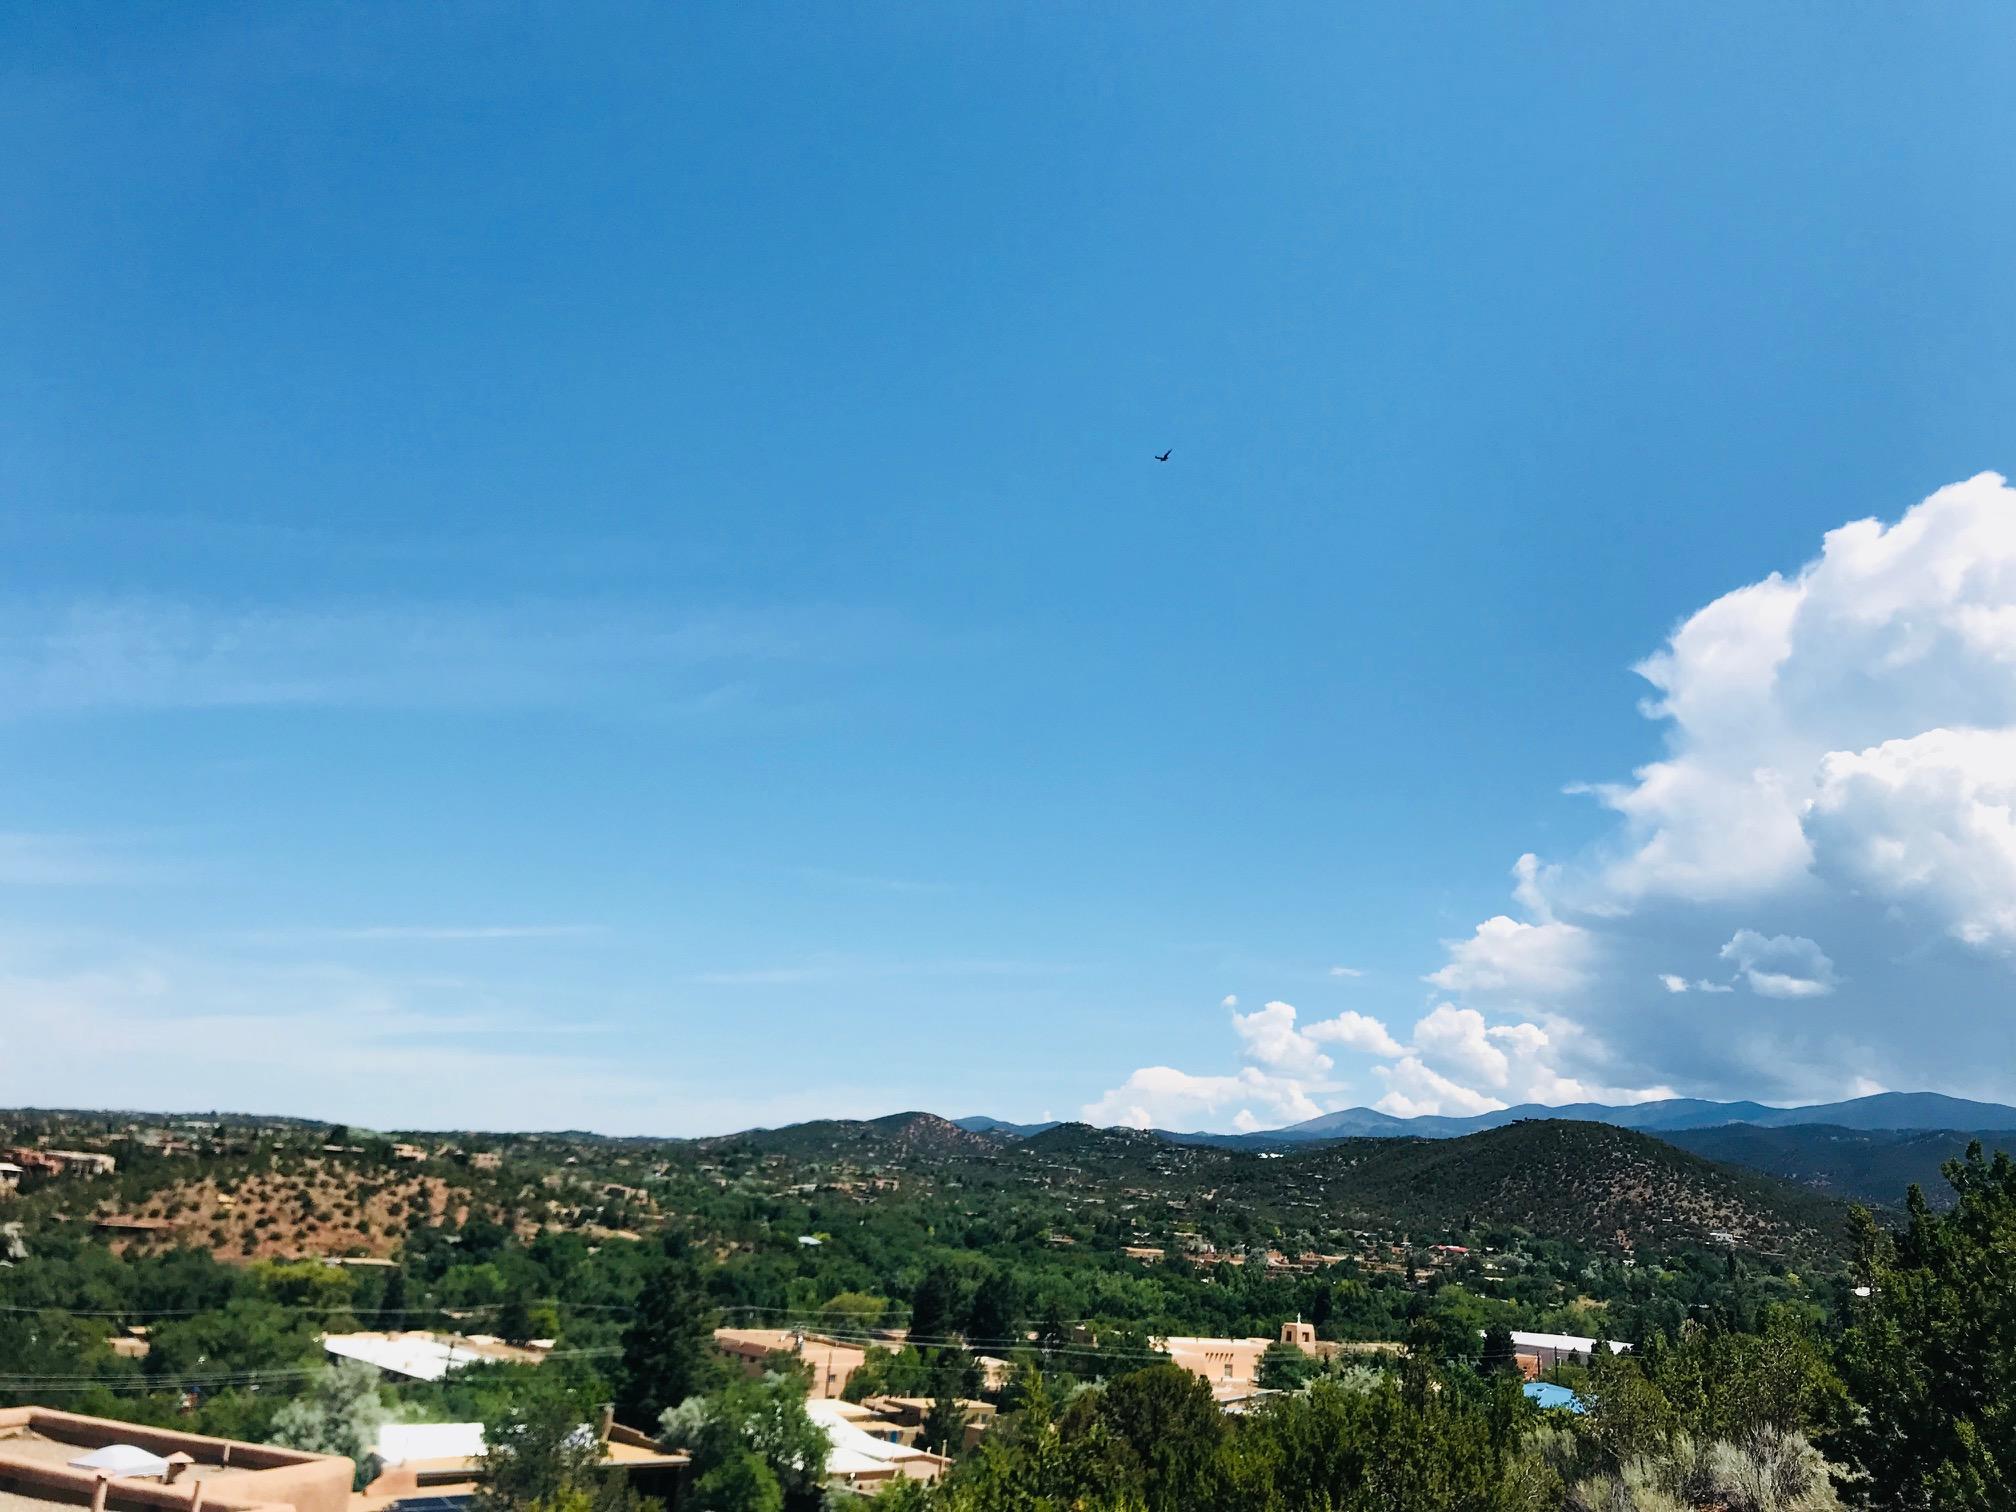 0 Camino San Acacio, Santa Fe, NM 87505 - Santa Fe, NM real estate listing